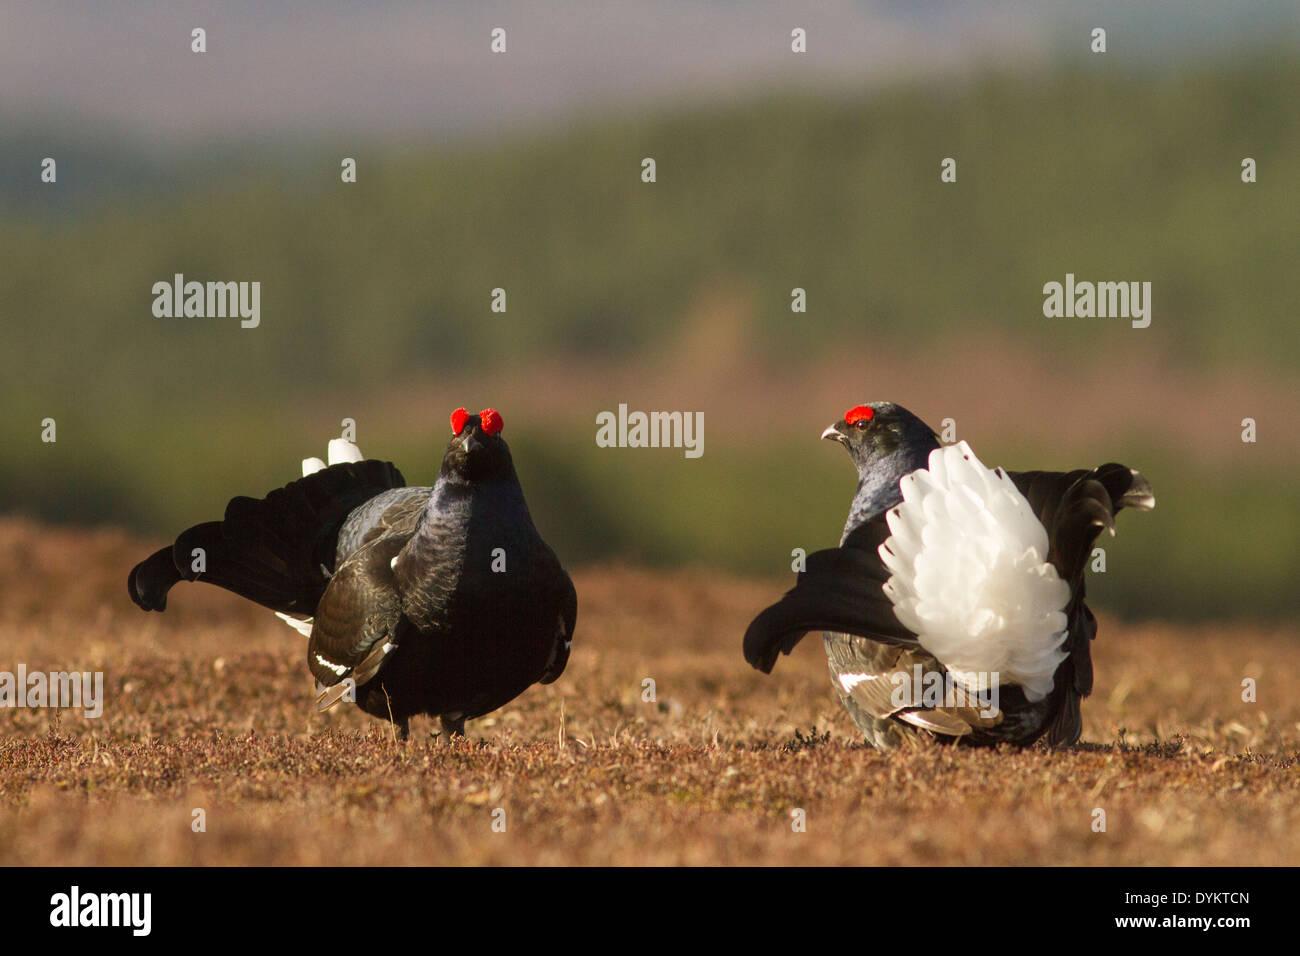 Black grouse (Tetrao tetrix) males displaying at lek site, Aberdeenshire, Scotland. - Stock Image